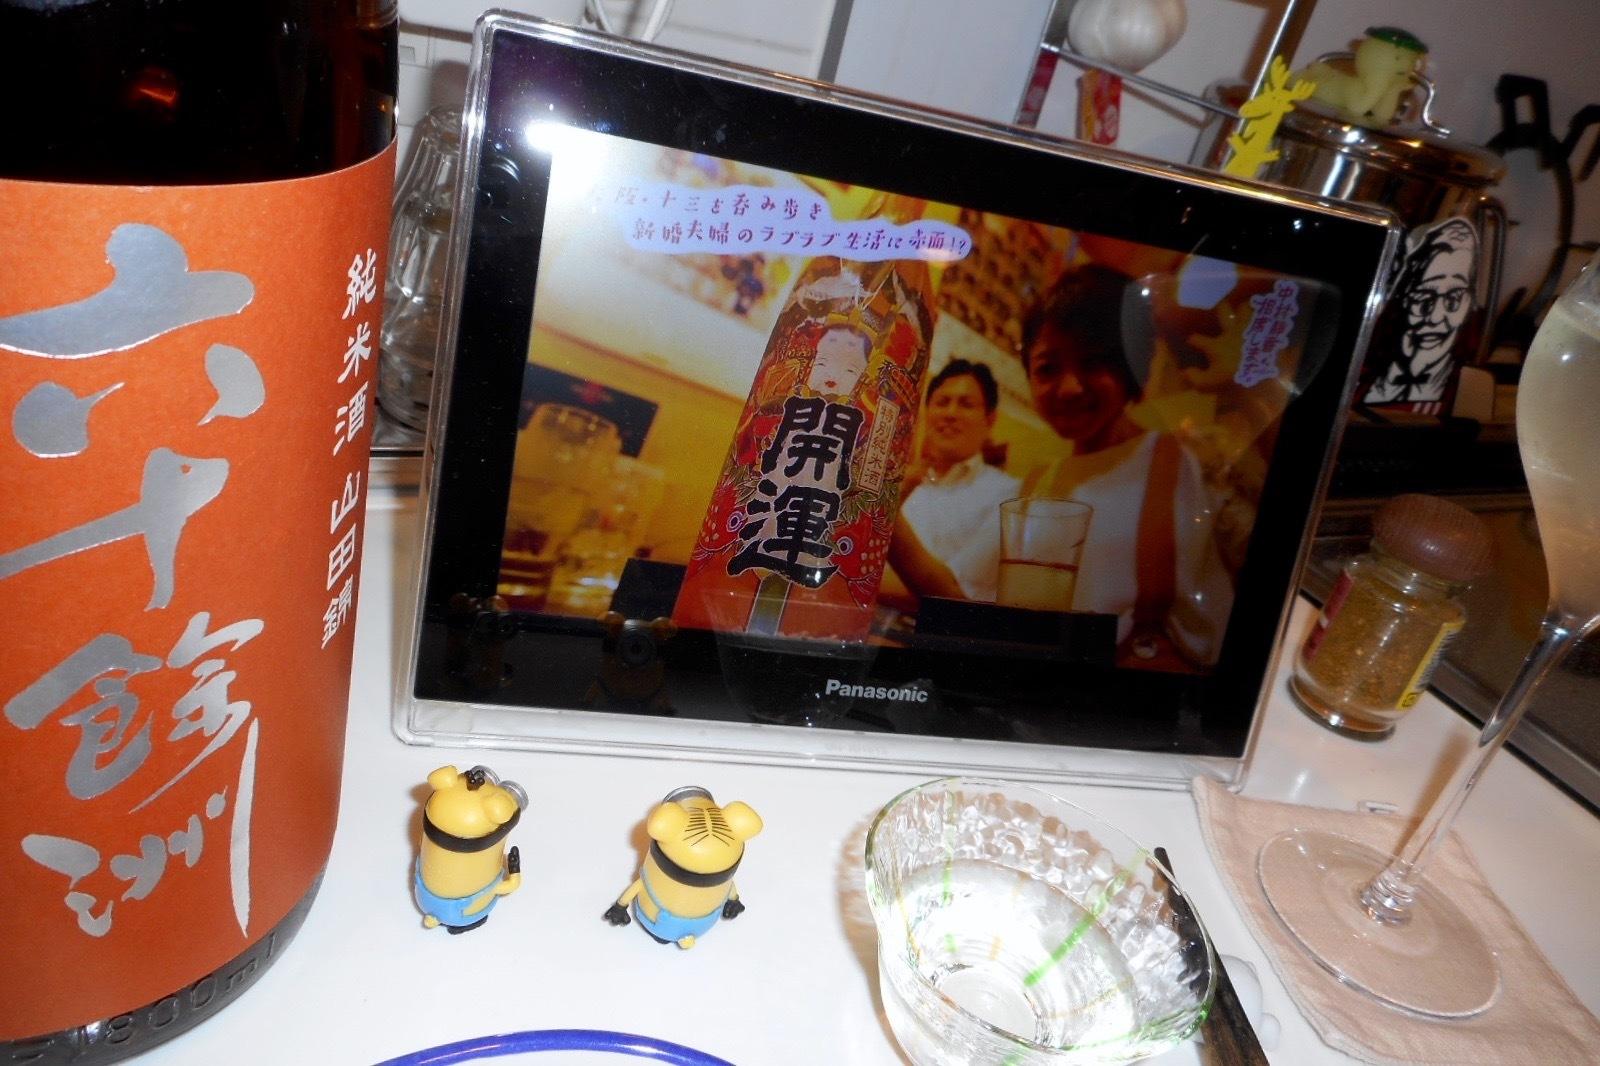 kuroemon_yamahai_omachi28by15.jpg